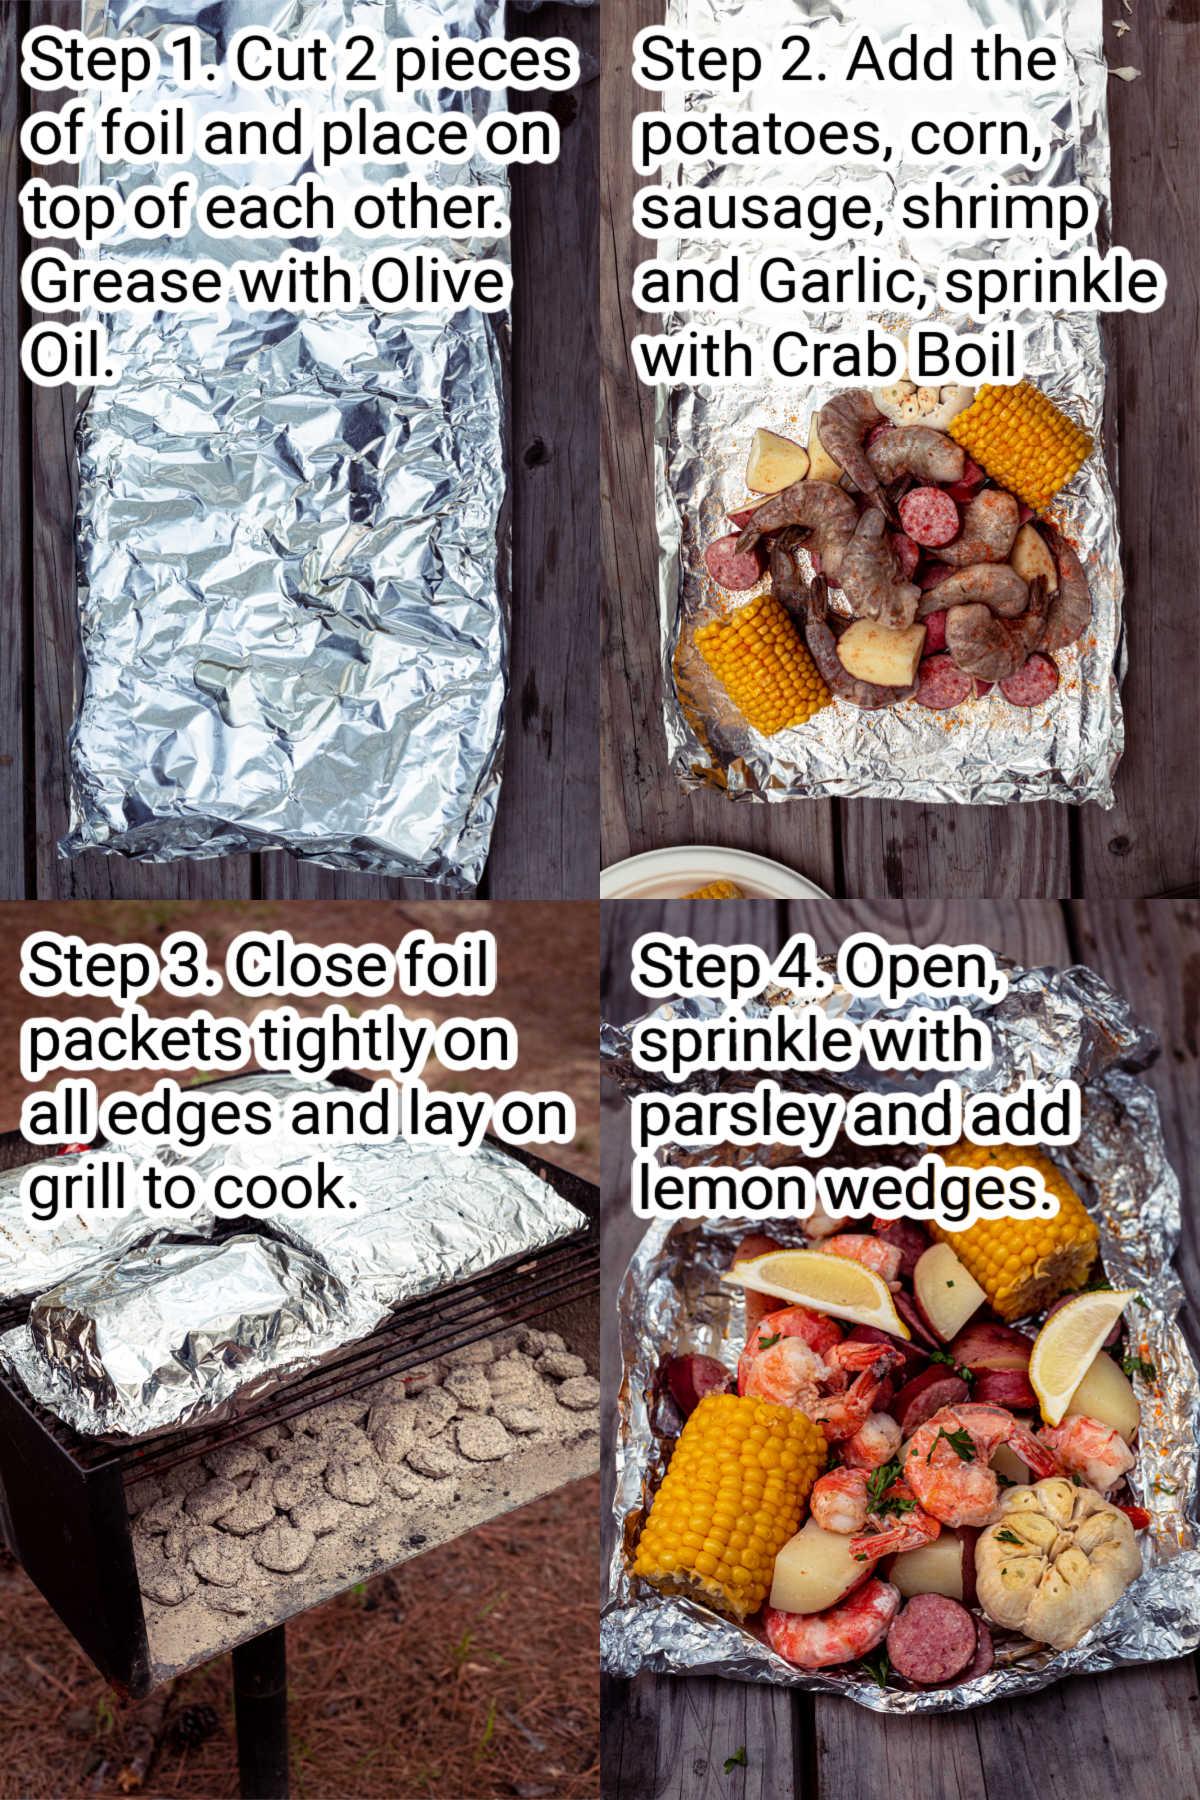 four steps showing how to make a shrimp boil foil packet